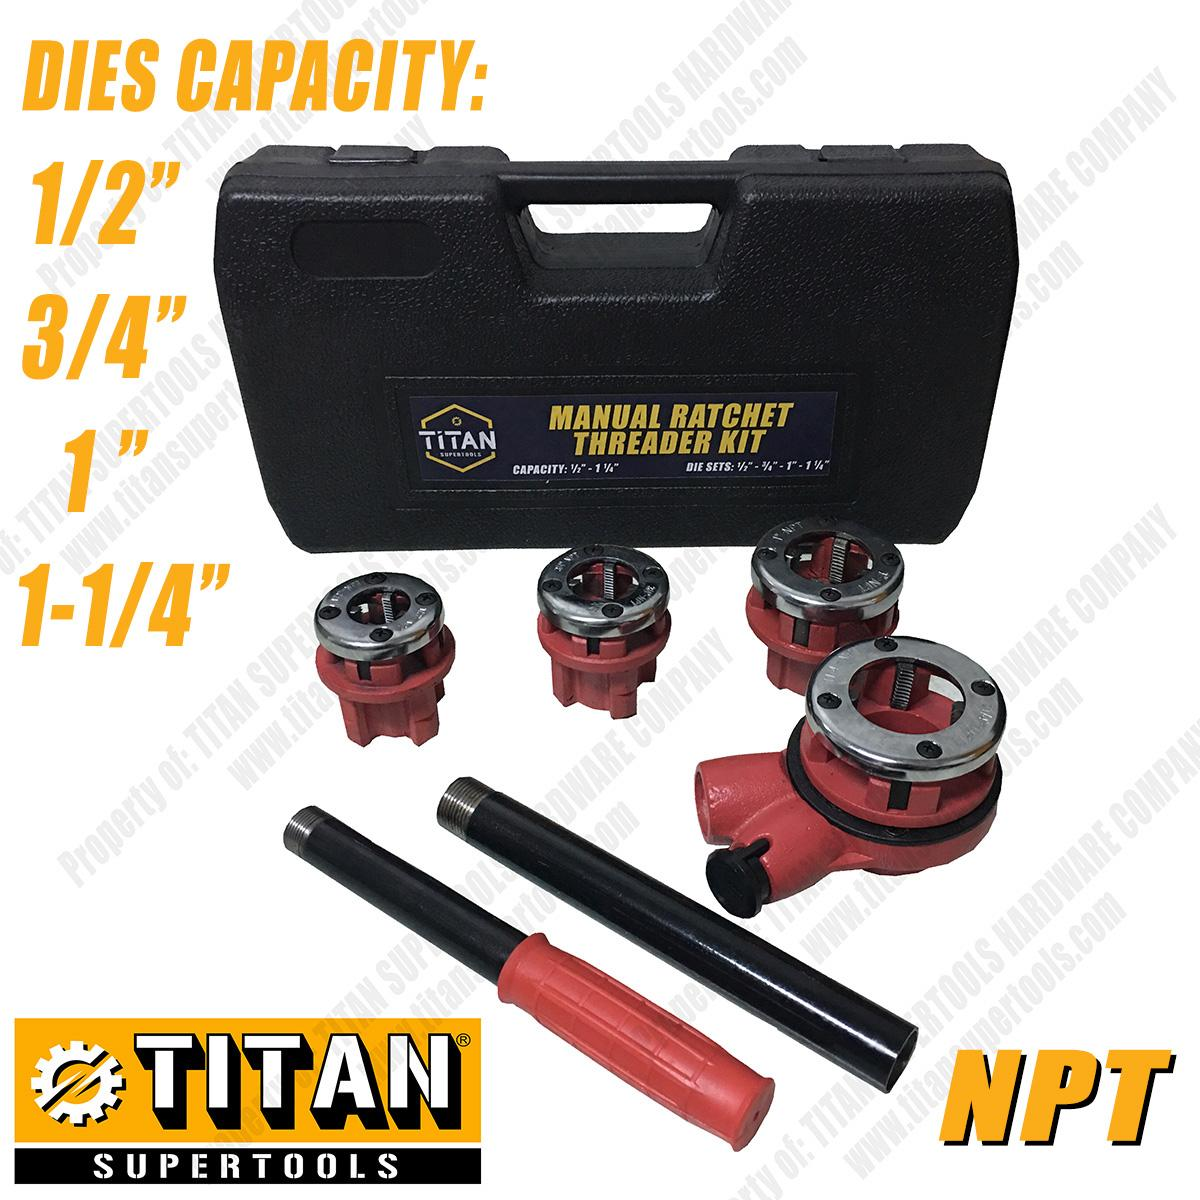 Titan Tools - Buy Titan Tools at Best Price in Philippines | www